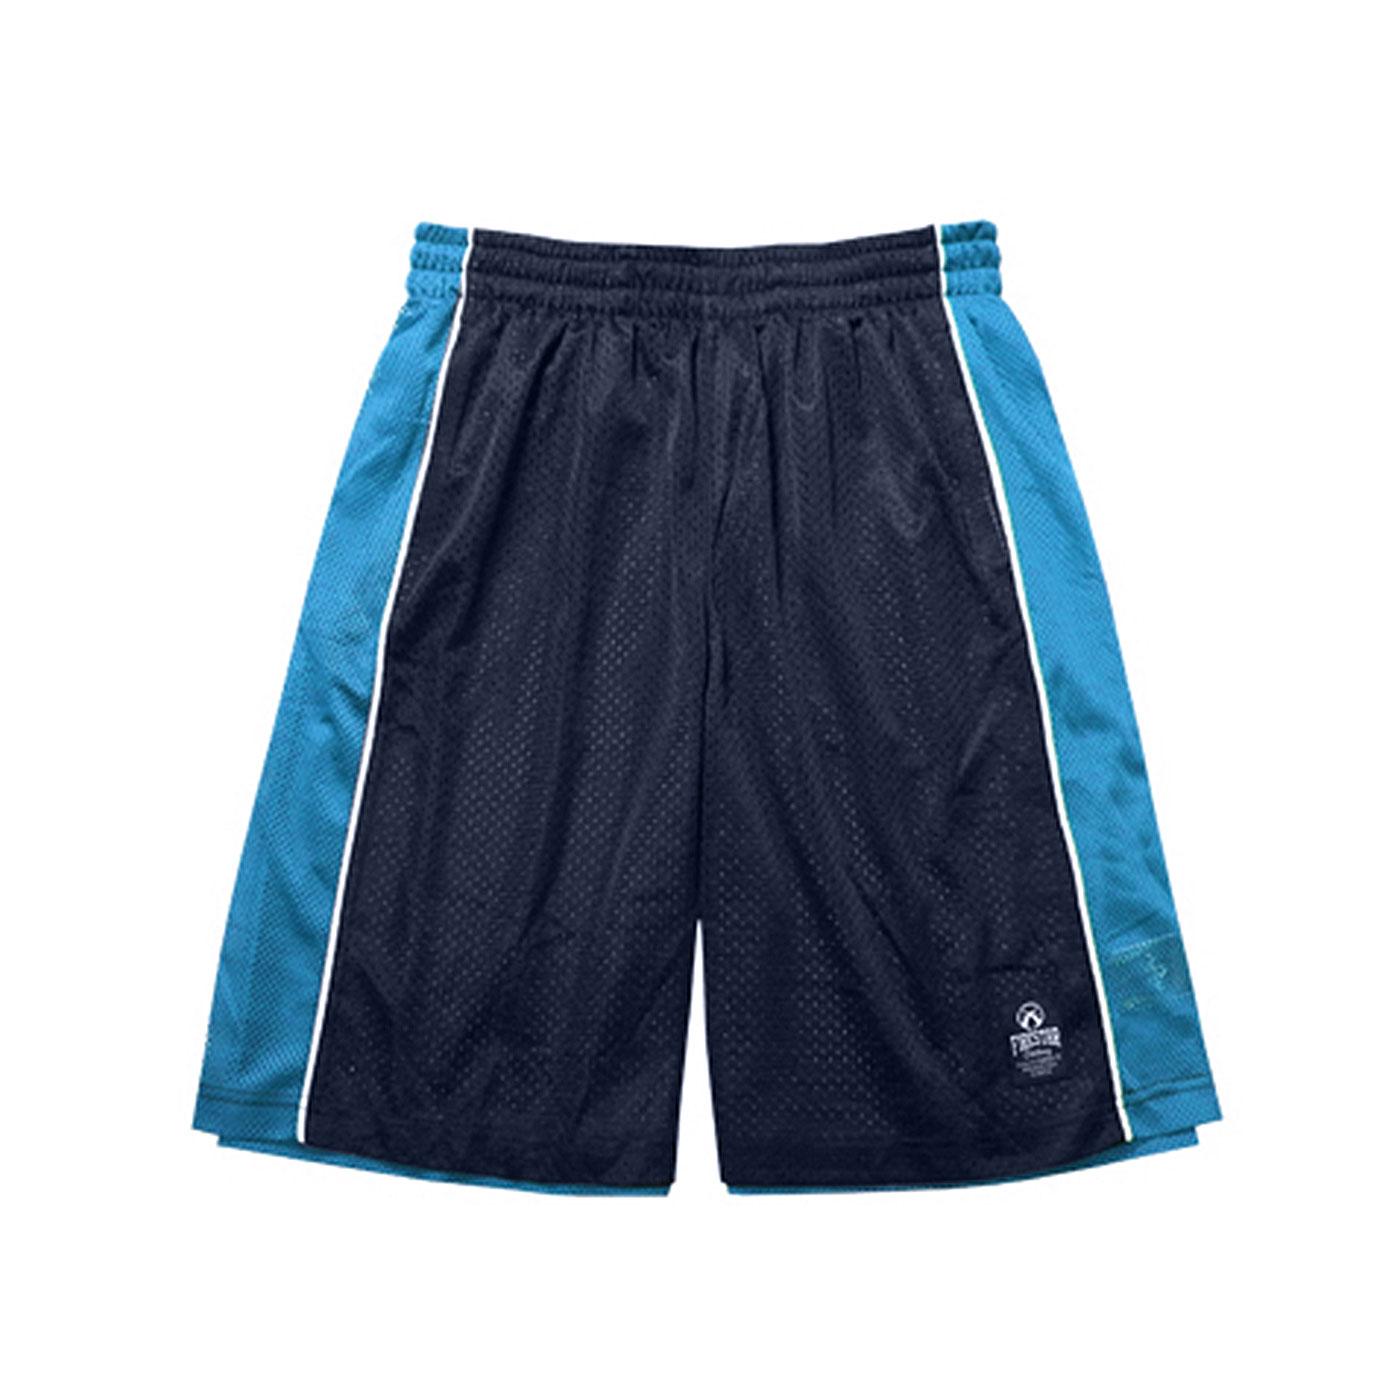 FIRESTAR 籃球褲 B3702-10 - 丈青水藍